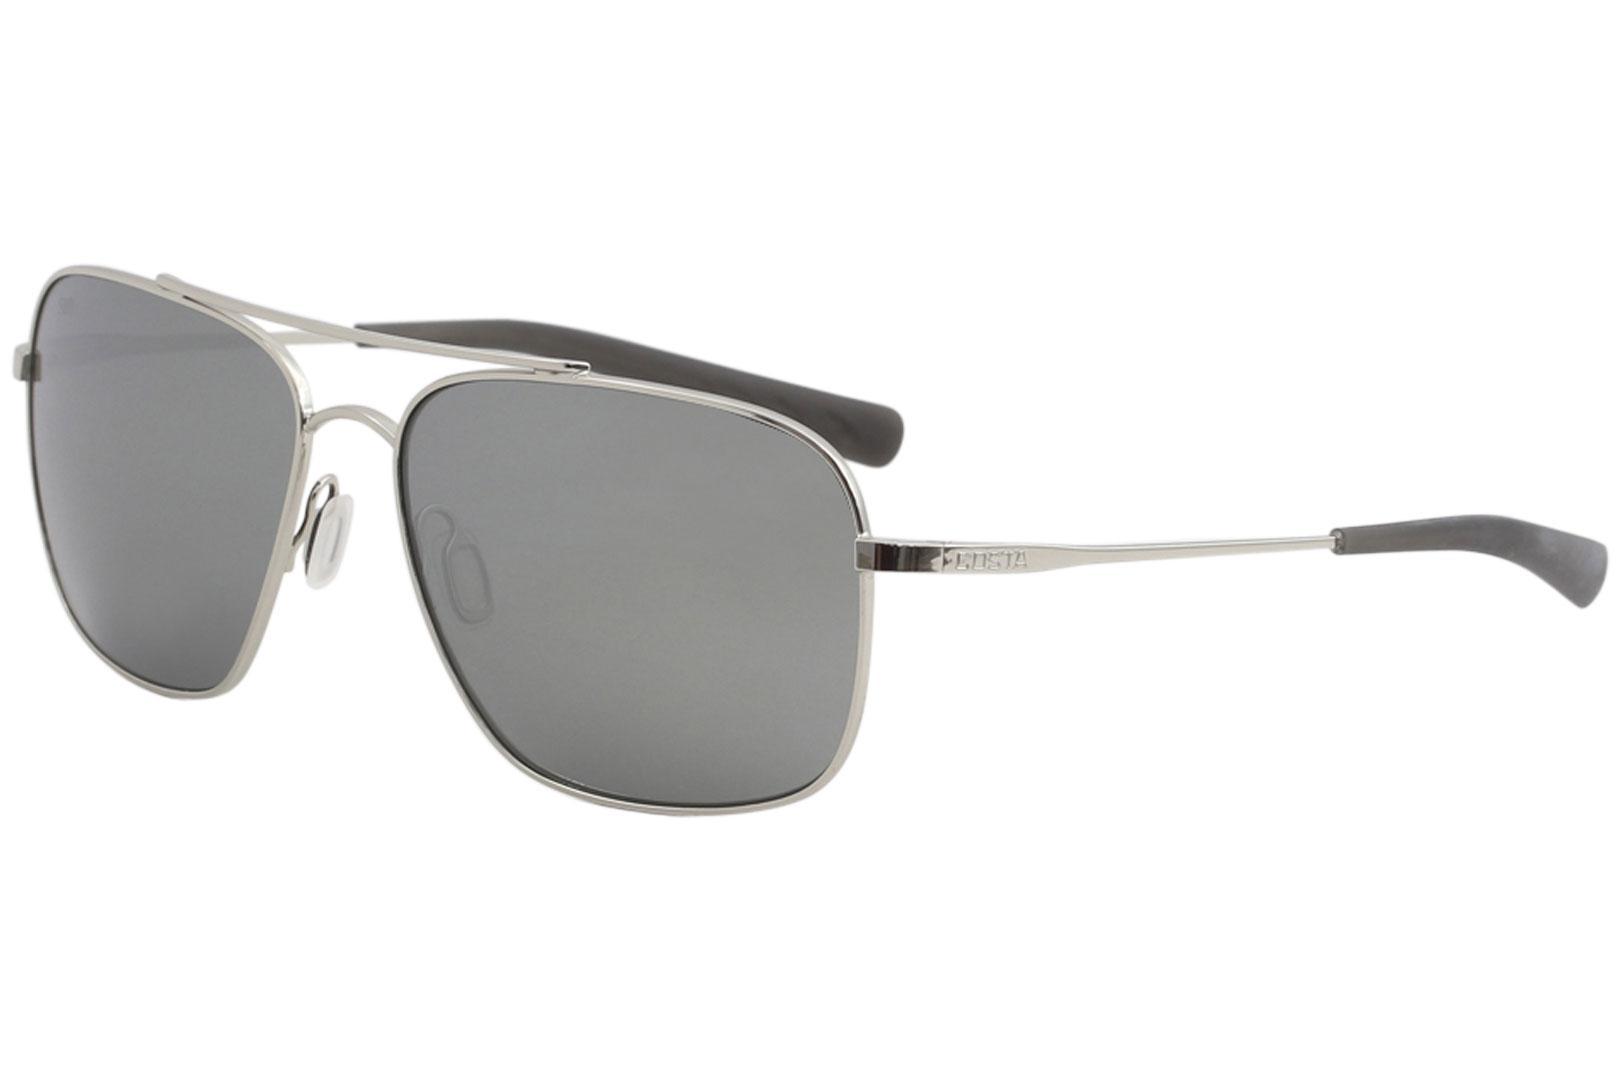 Men's  Fashion Pilot Polarized Titanium Sunglasses - Shiny Palladium/Polarized Grey Silver Mirror - Lens 59 Bridge 16 Temple 135mm - Costa Del Mar Canaveral